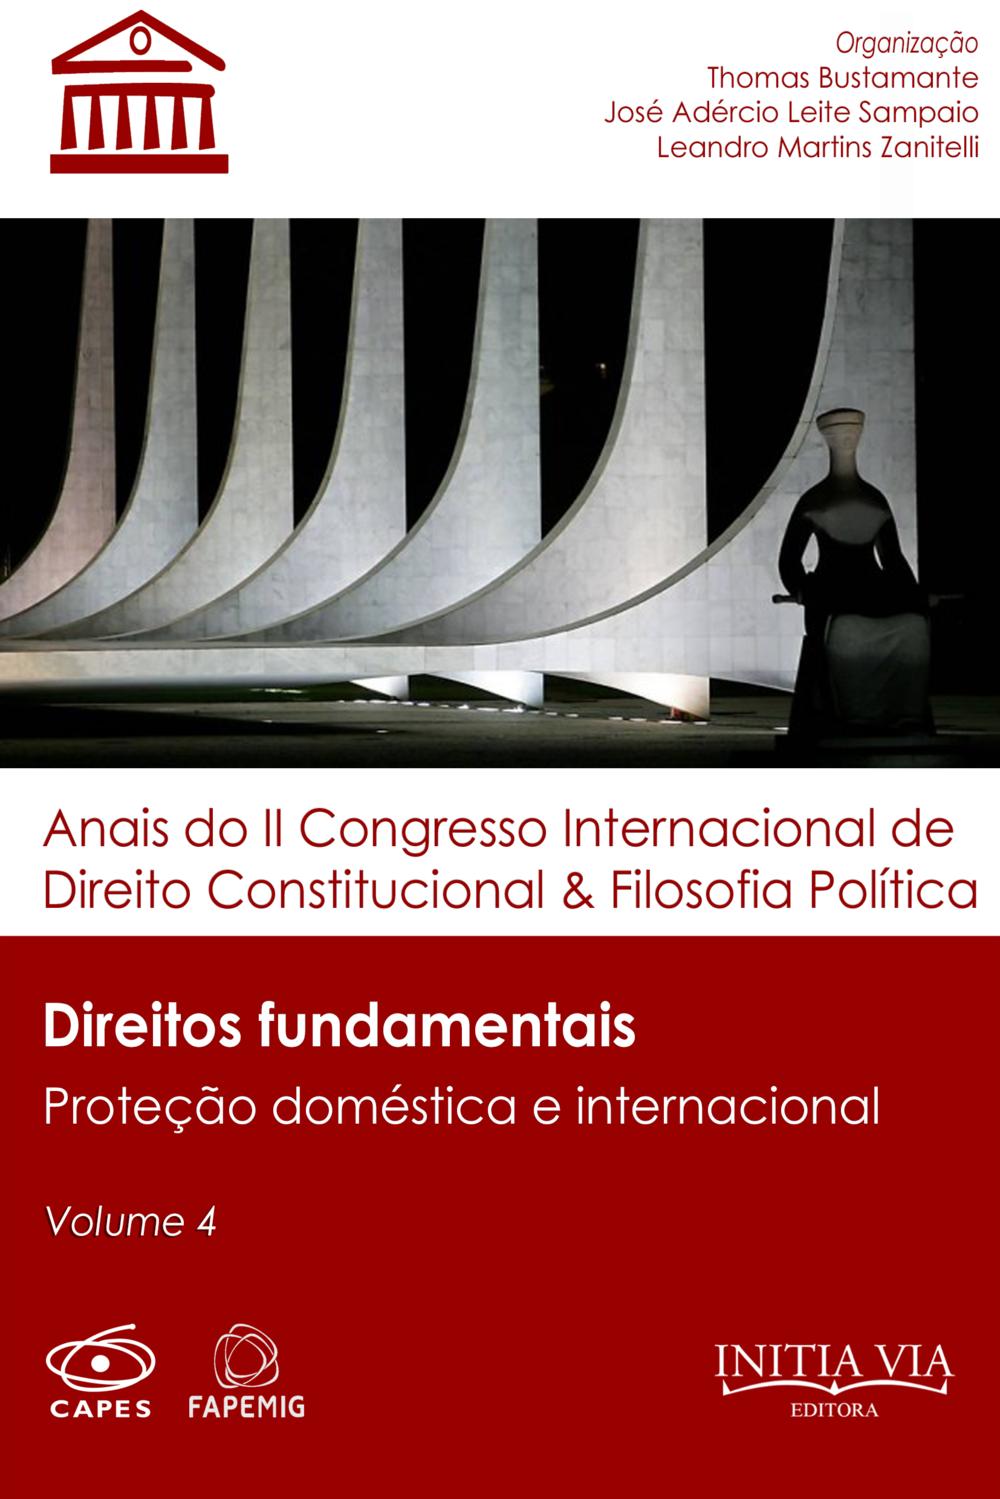 Bustamante_Congresso_DCFP15_V04.png